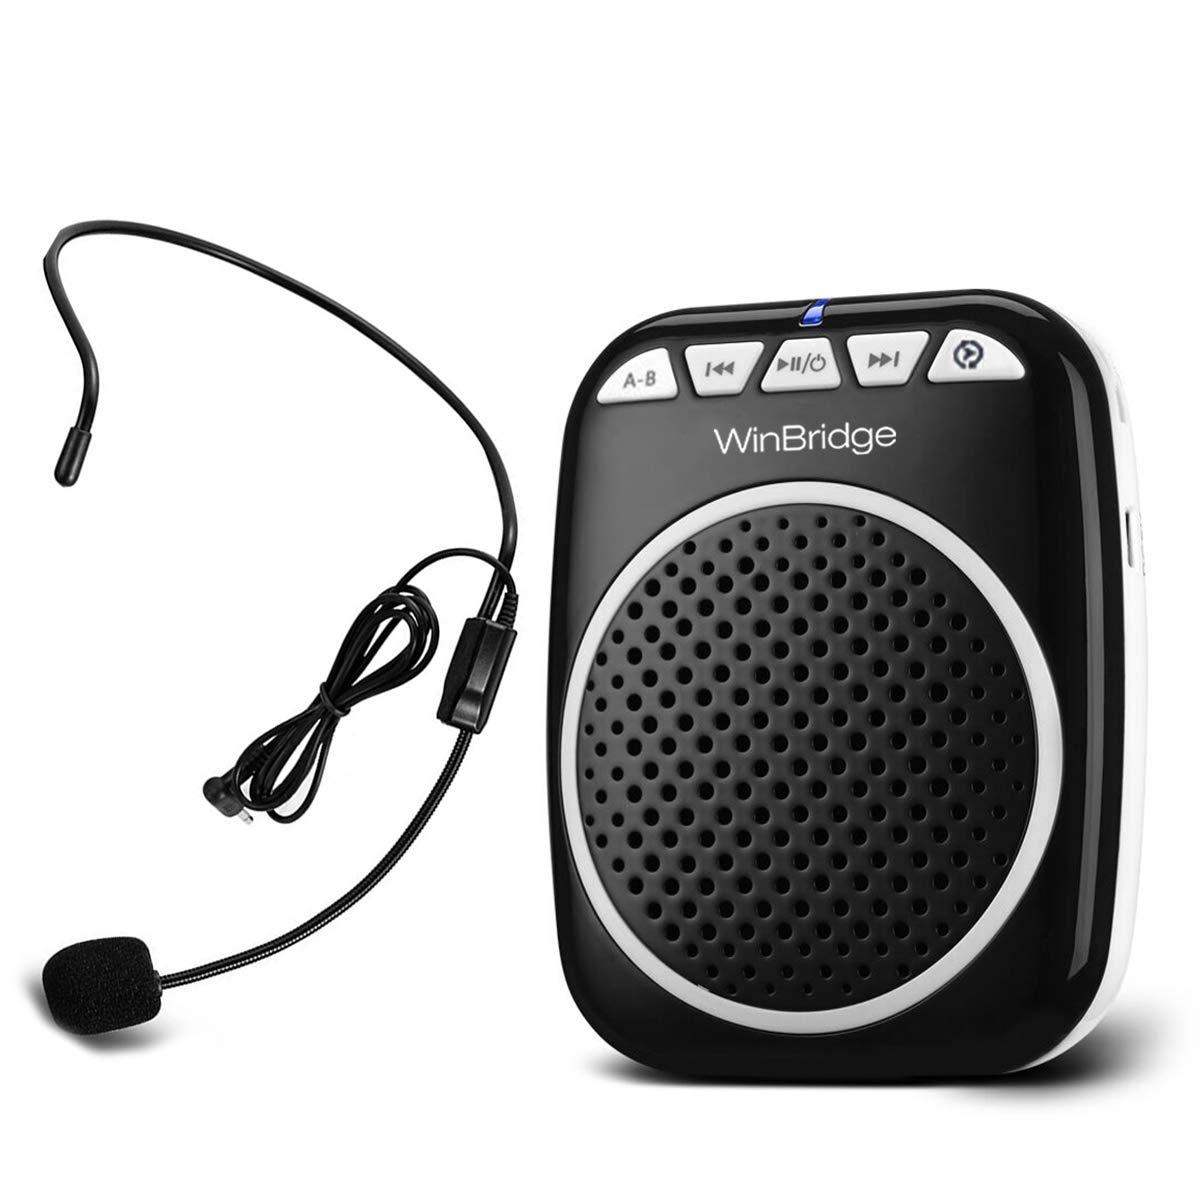 W WINBRIDGE Voice Amplifier Portable Microphone and Speaker Loudspeaker Personal Microphone Speech Amplifier Clip On for Teacher, Elderly,Coaches, Training, Presentation, Tour Guide by W WINBRIDGE